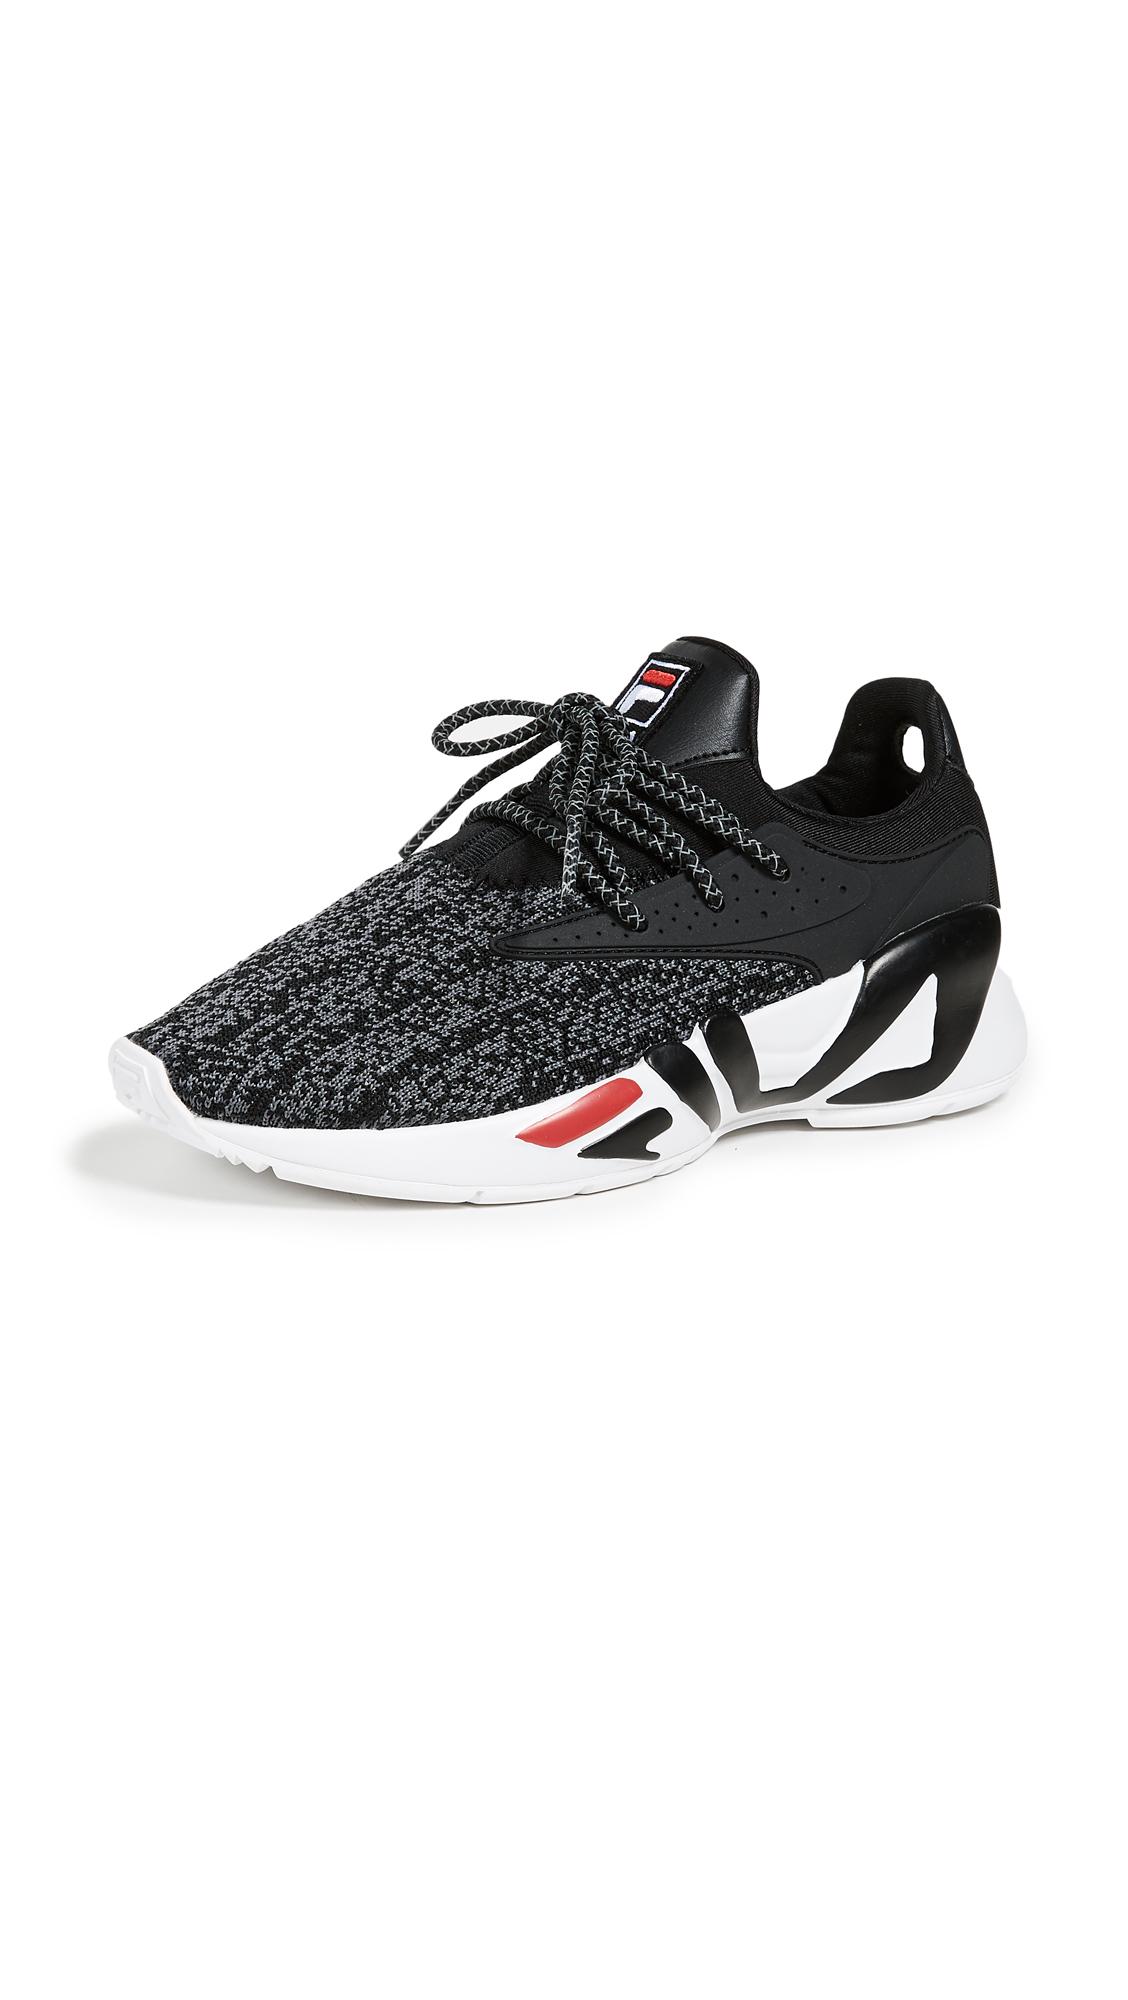 Fila Mindbreaker Sneakers - Black/White/Fila Red